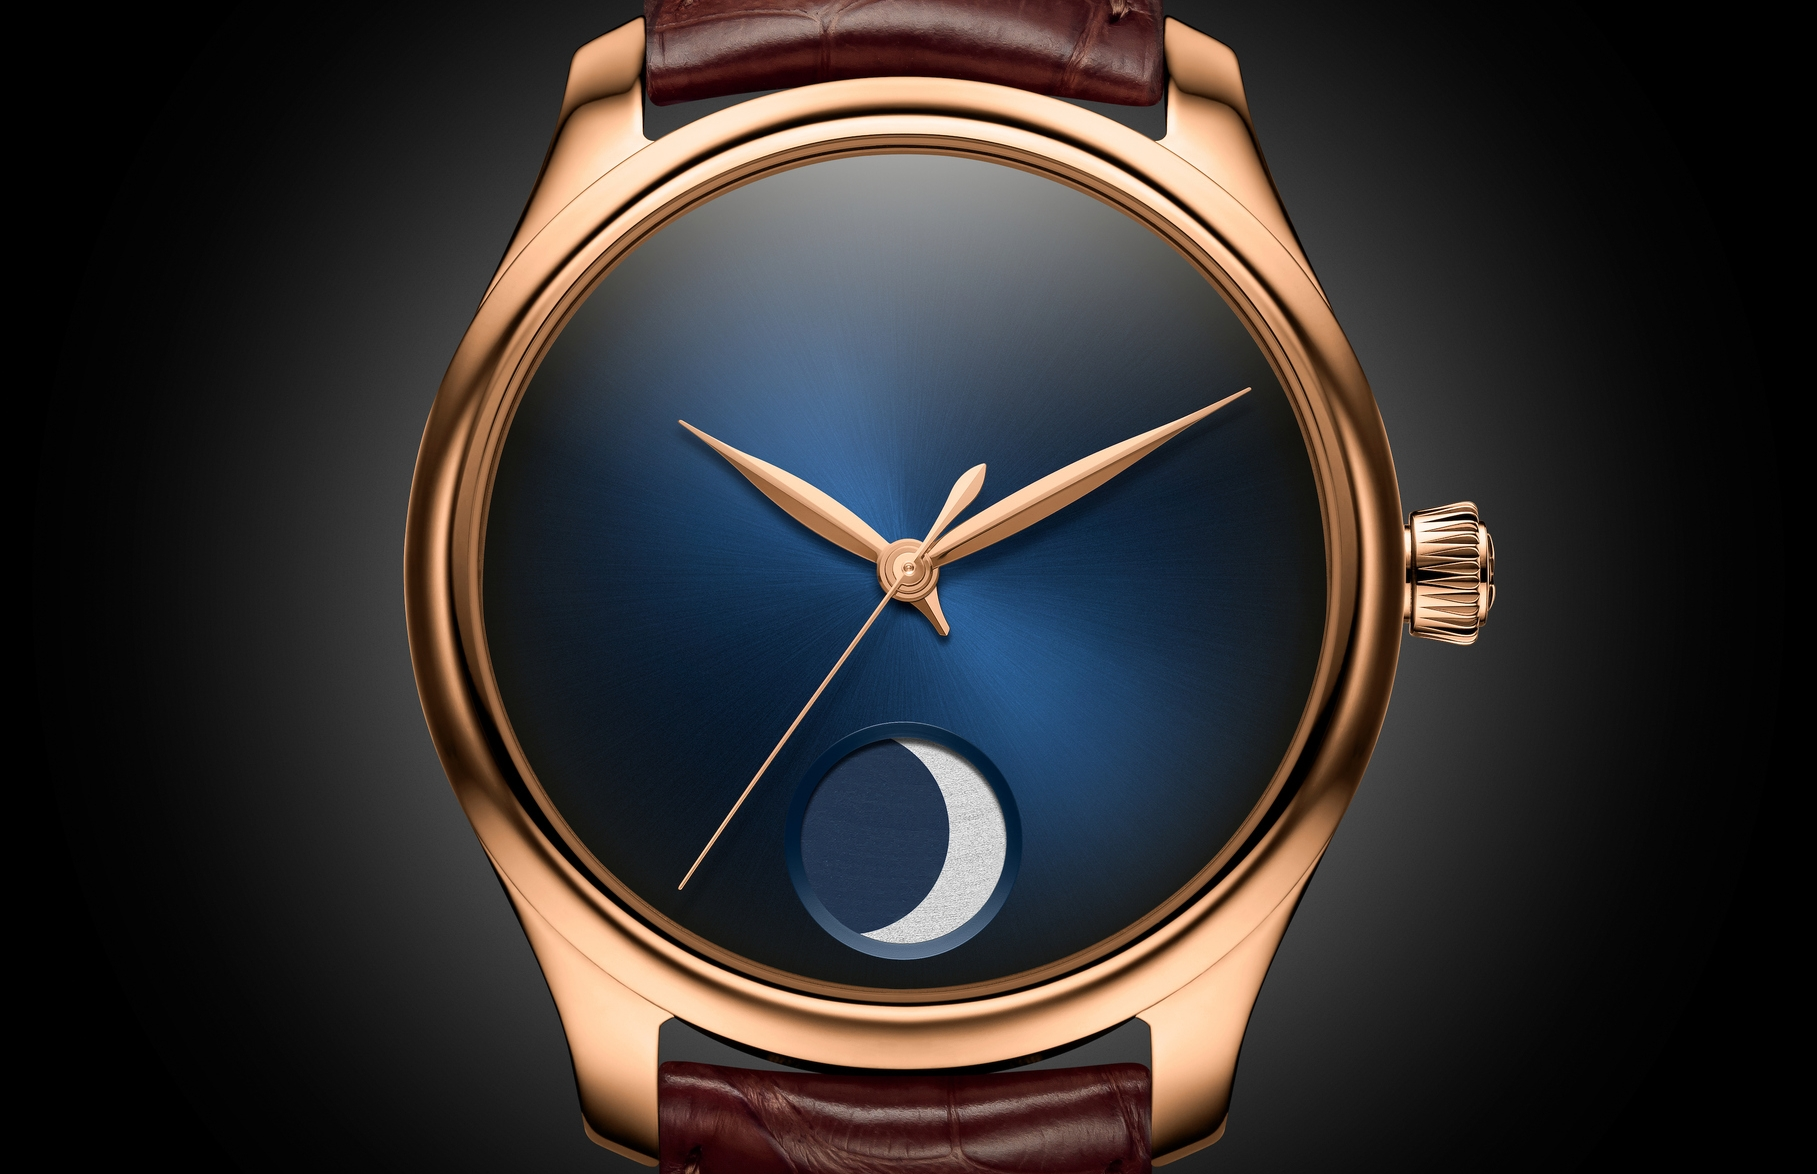 H Moser Cie Endeavour Perpetual Moon Concept 1801-0400